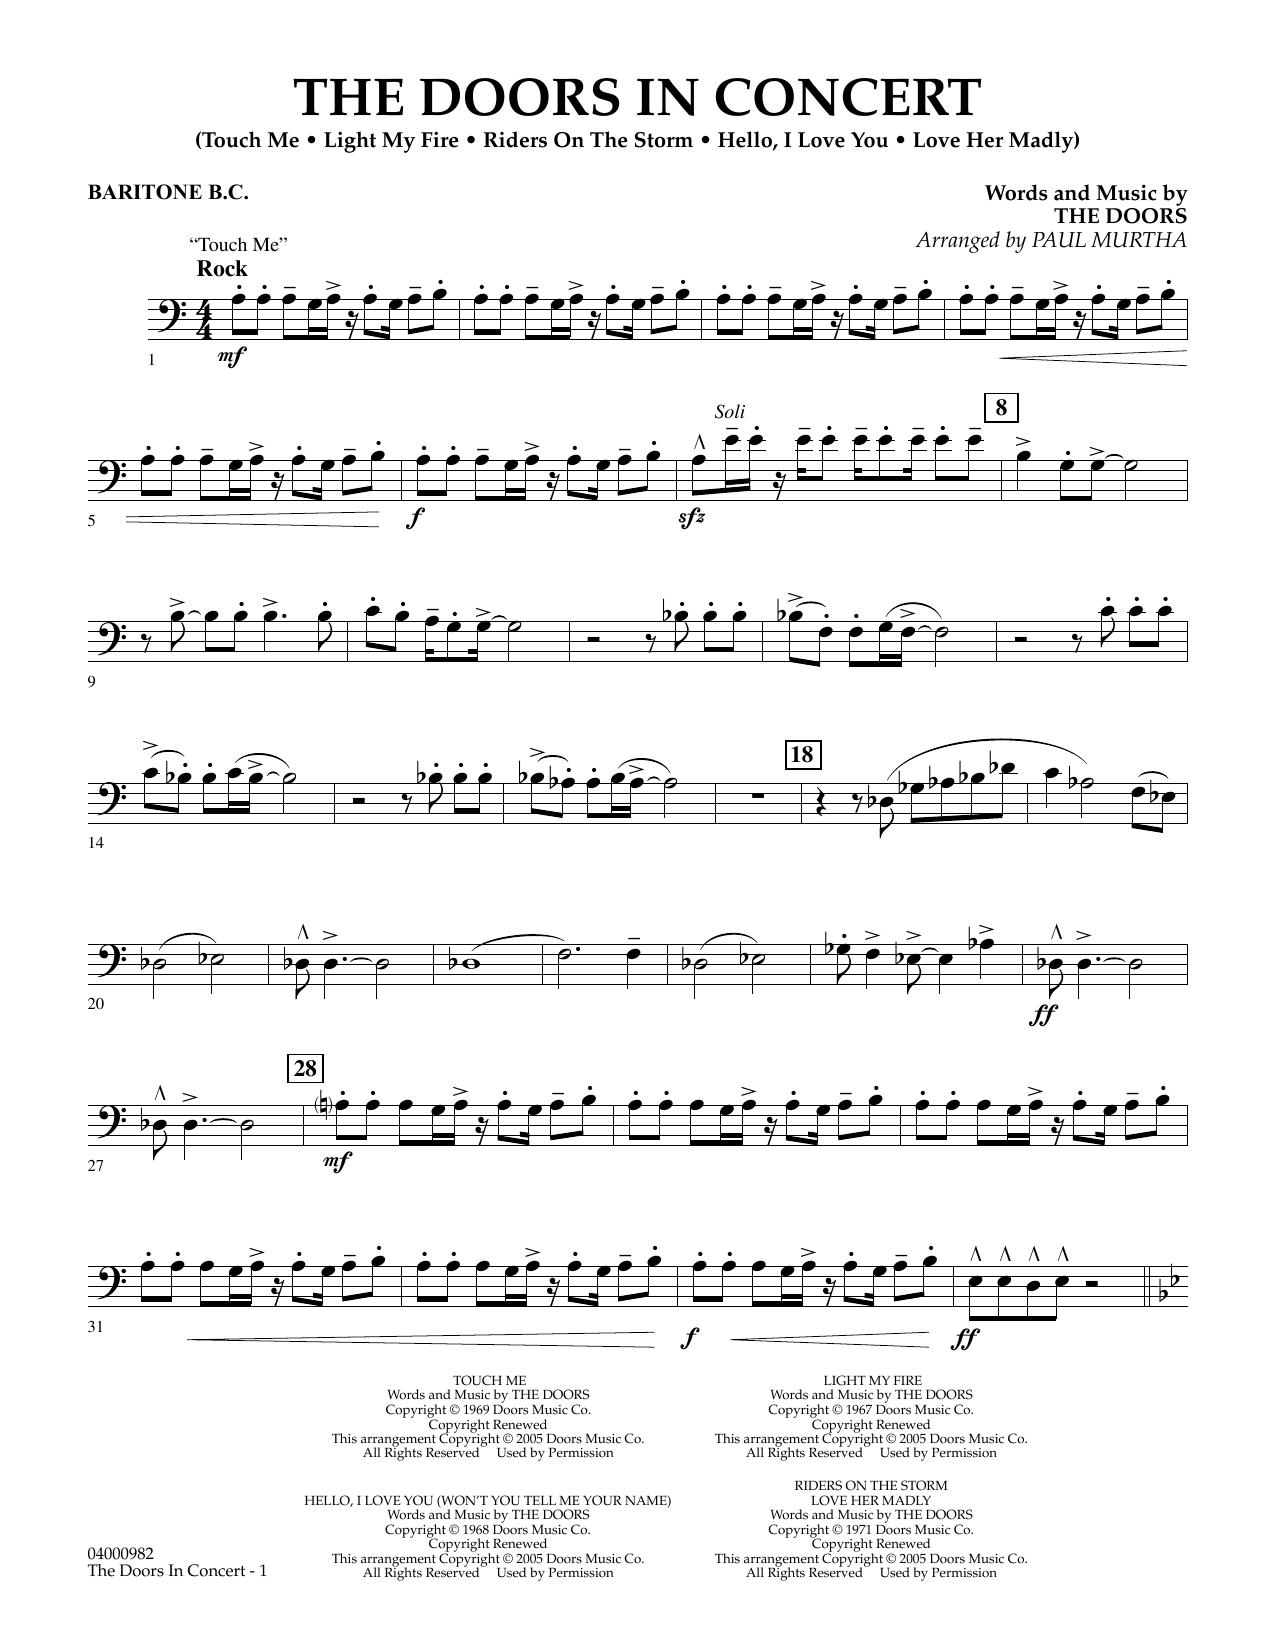 The Doors in Concert (arr. Paul Murtha) - Baritone B.C. (Concert Band)